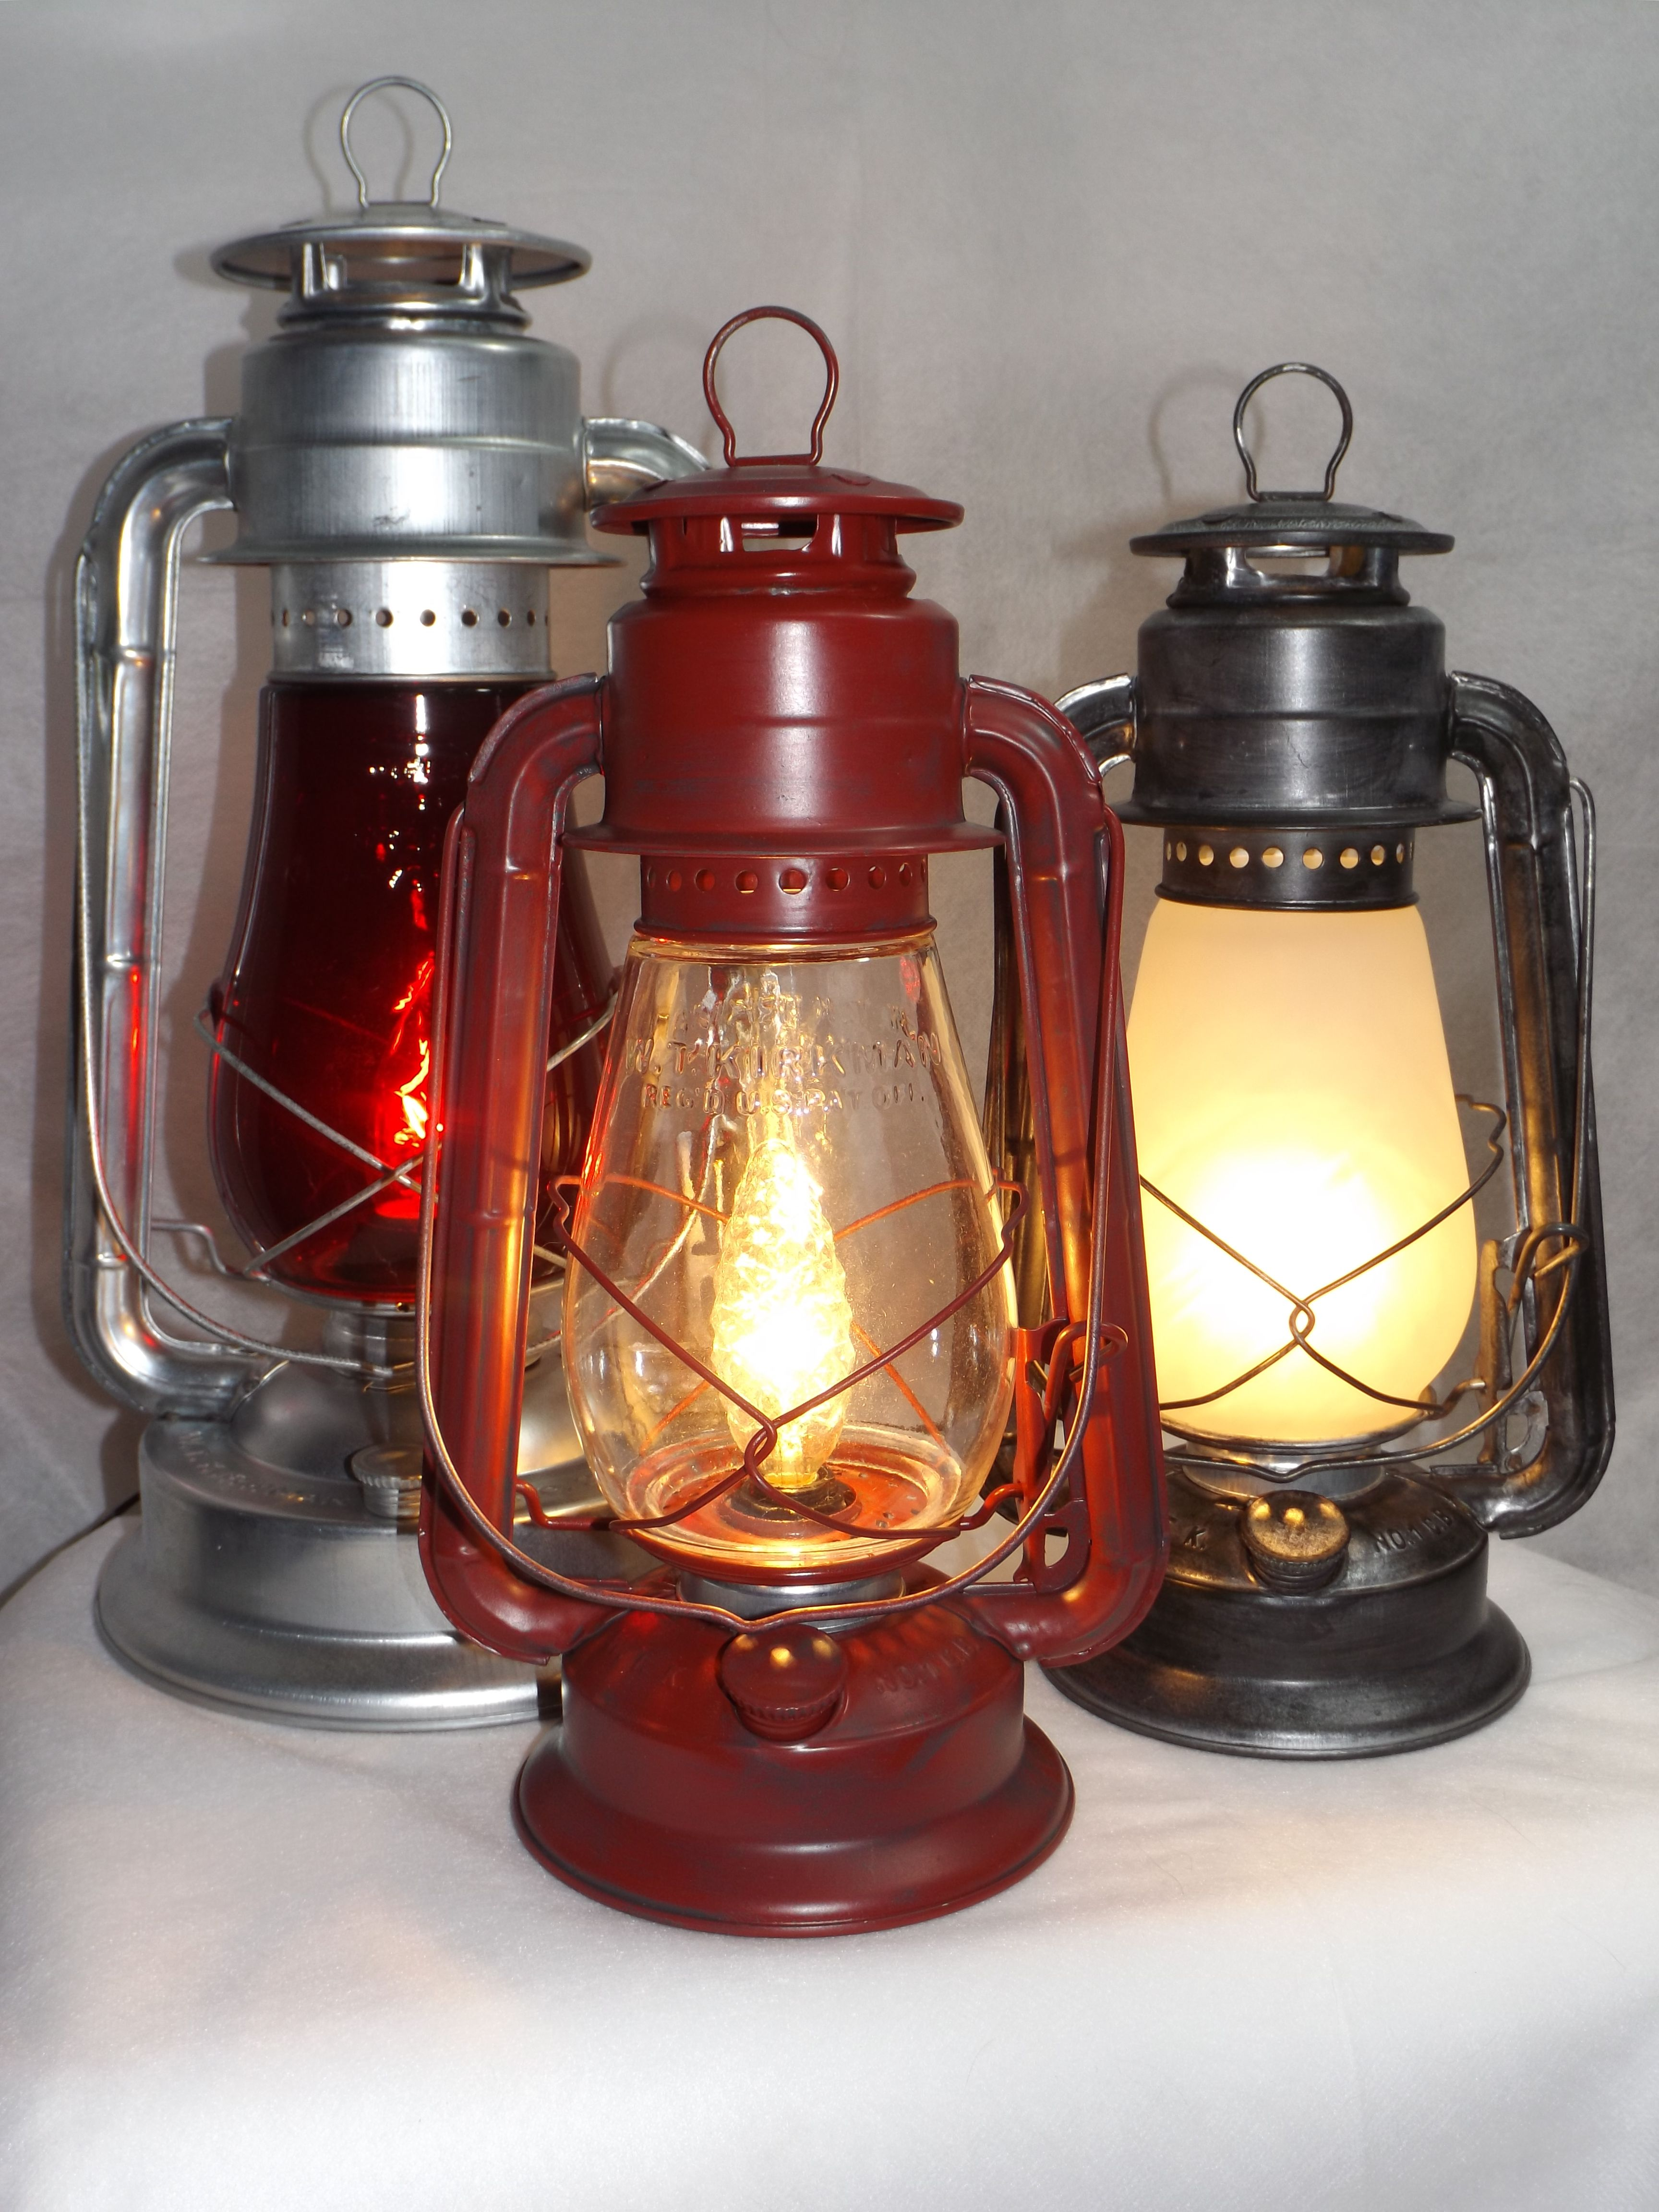 Pretty electric lanterns by big rock lanterns bigrocklanterns electric lanterns by big rock lanterns bigrocklanterns arubaitofo Images